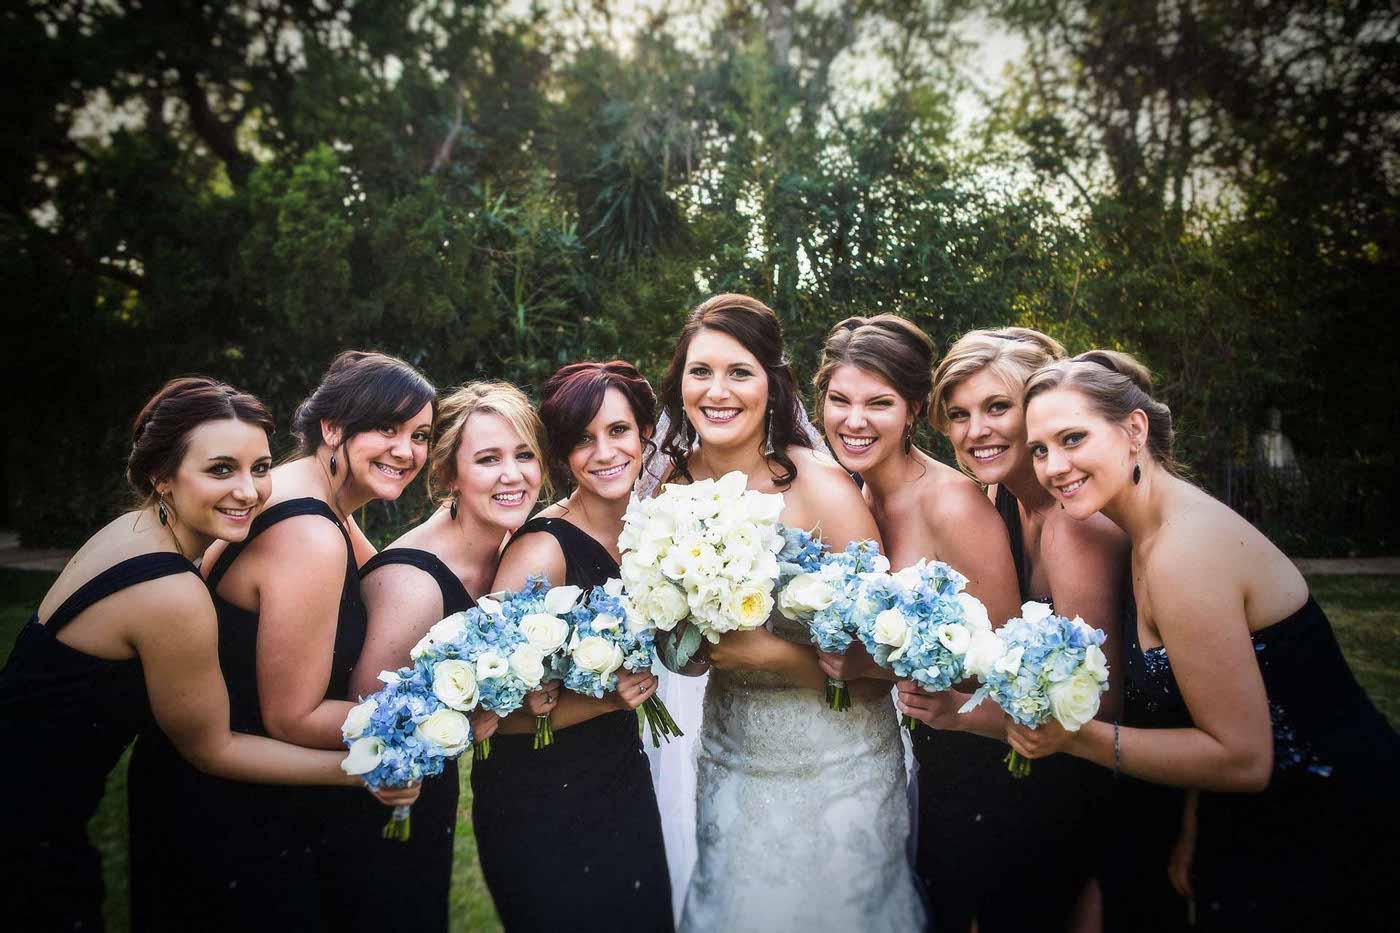 Bridesmaid Wedding Photos Flowers